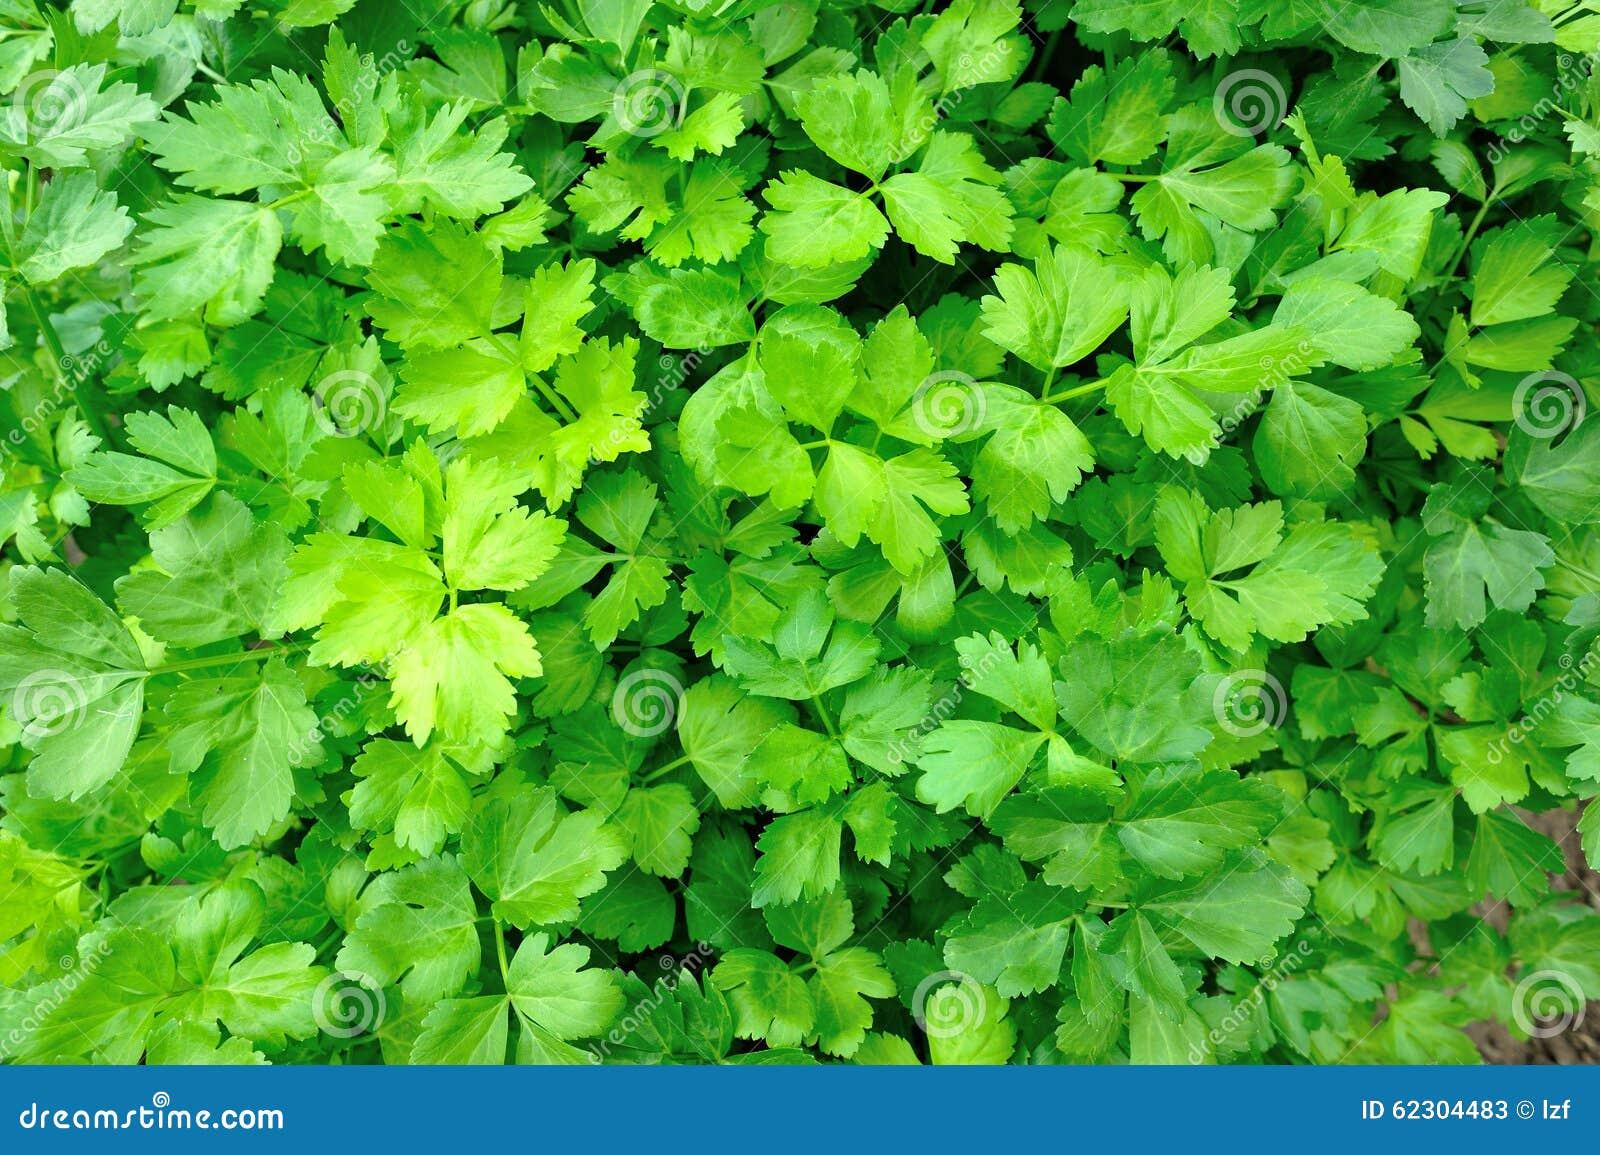 Pianta verde del sedano in orto fotografia stock for Pianta da pavimento verde